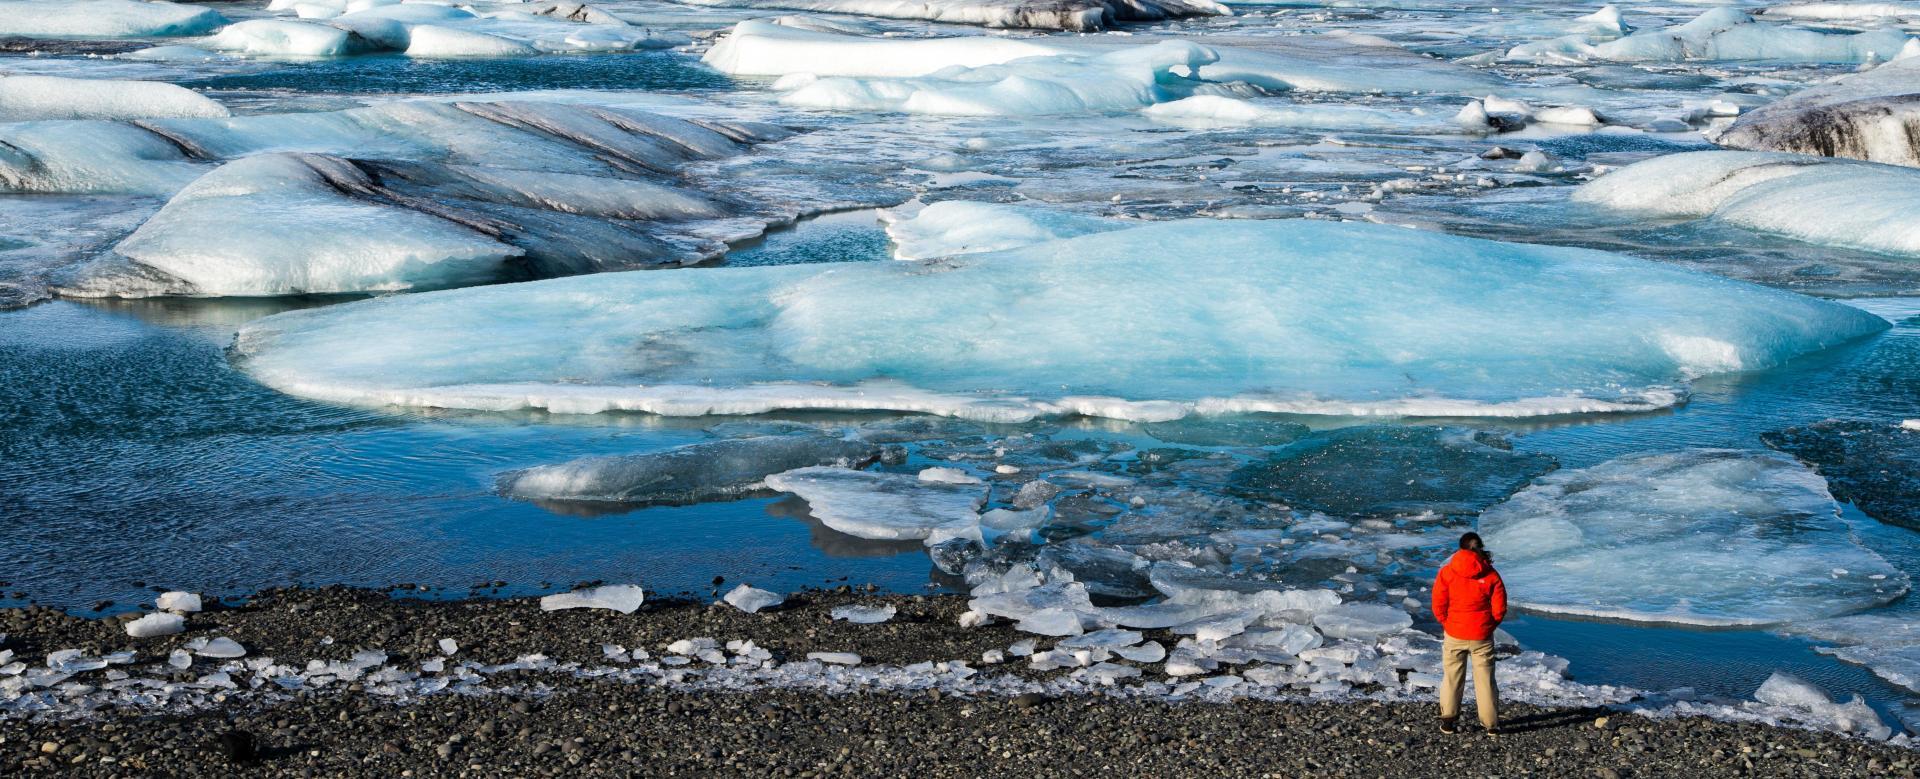 Voyage à pied : Islande : Volcans et glaciers